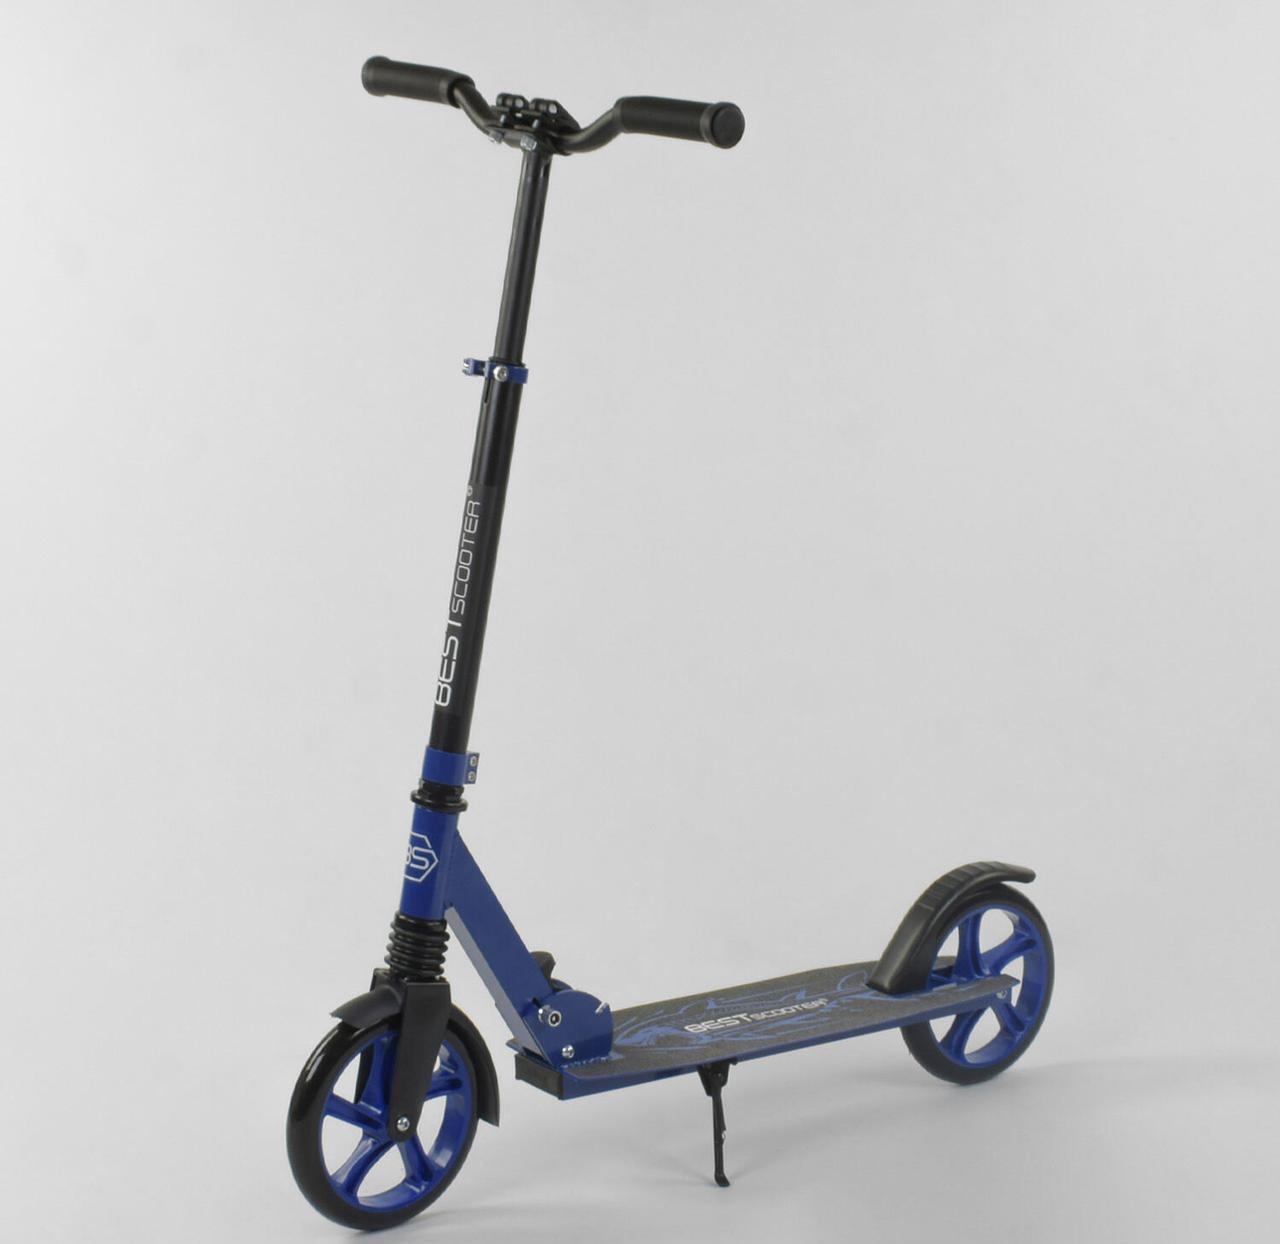 Самокат 14653  Best Scooter SHARK Синий  зажим руля  колеса PU 20 см 1 аммортизатор, в коробке